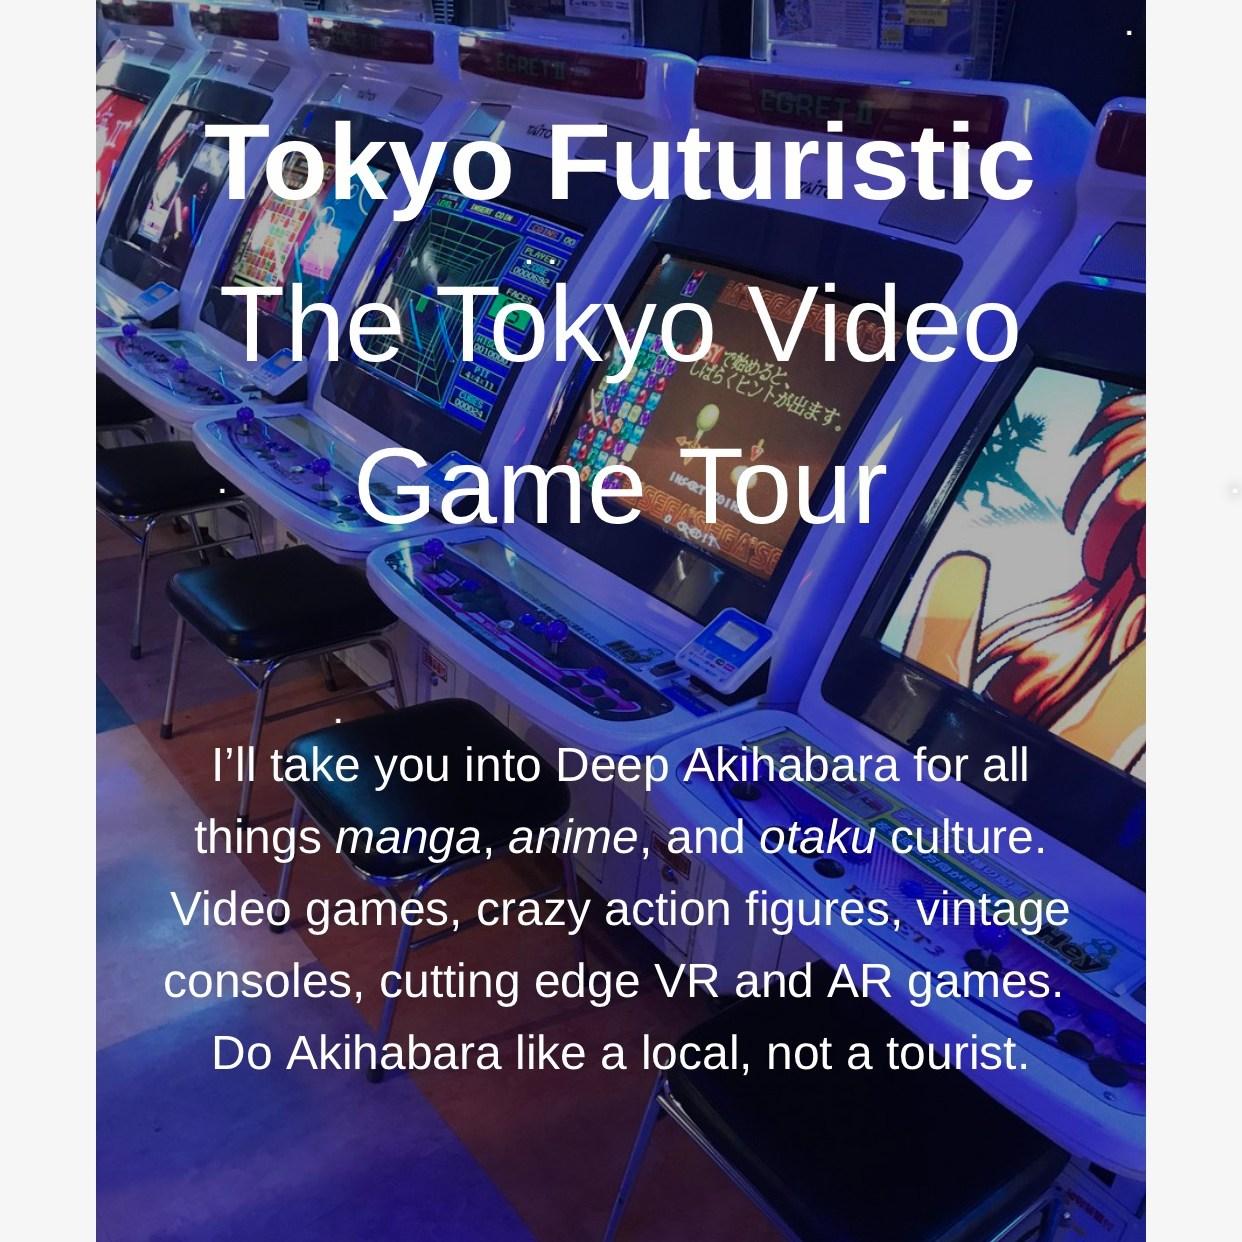 Tokyo Video Game Tour